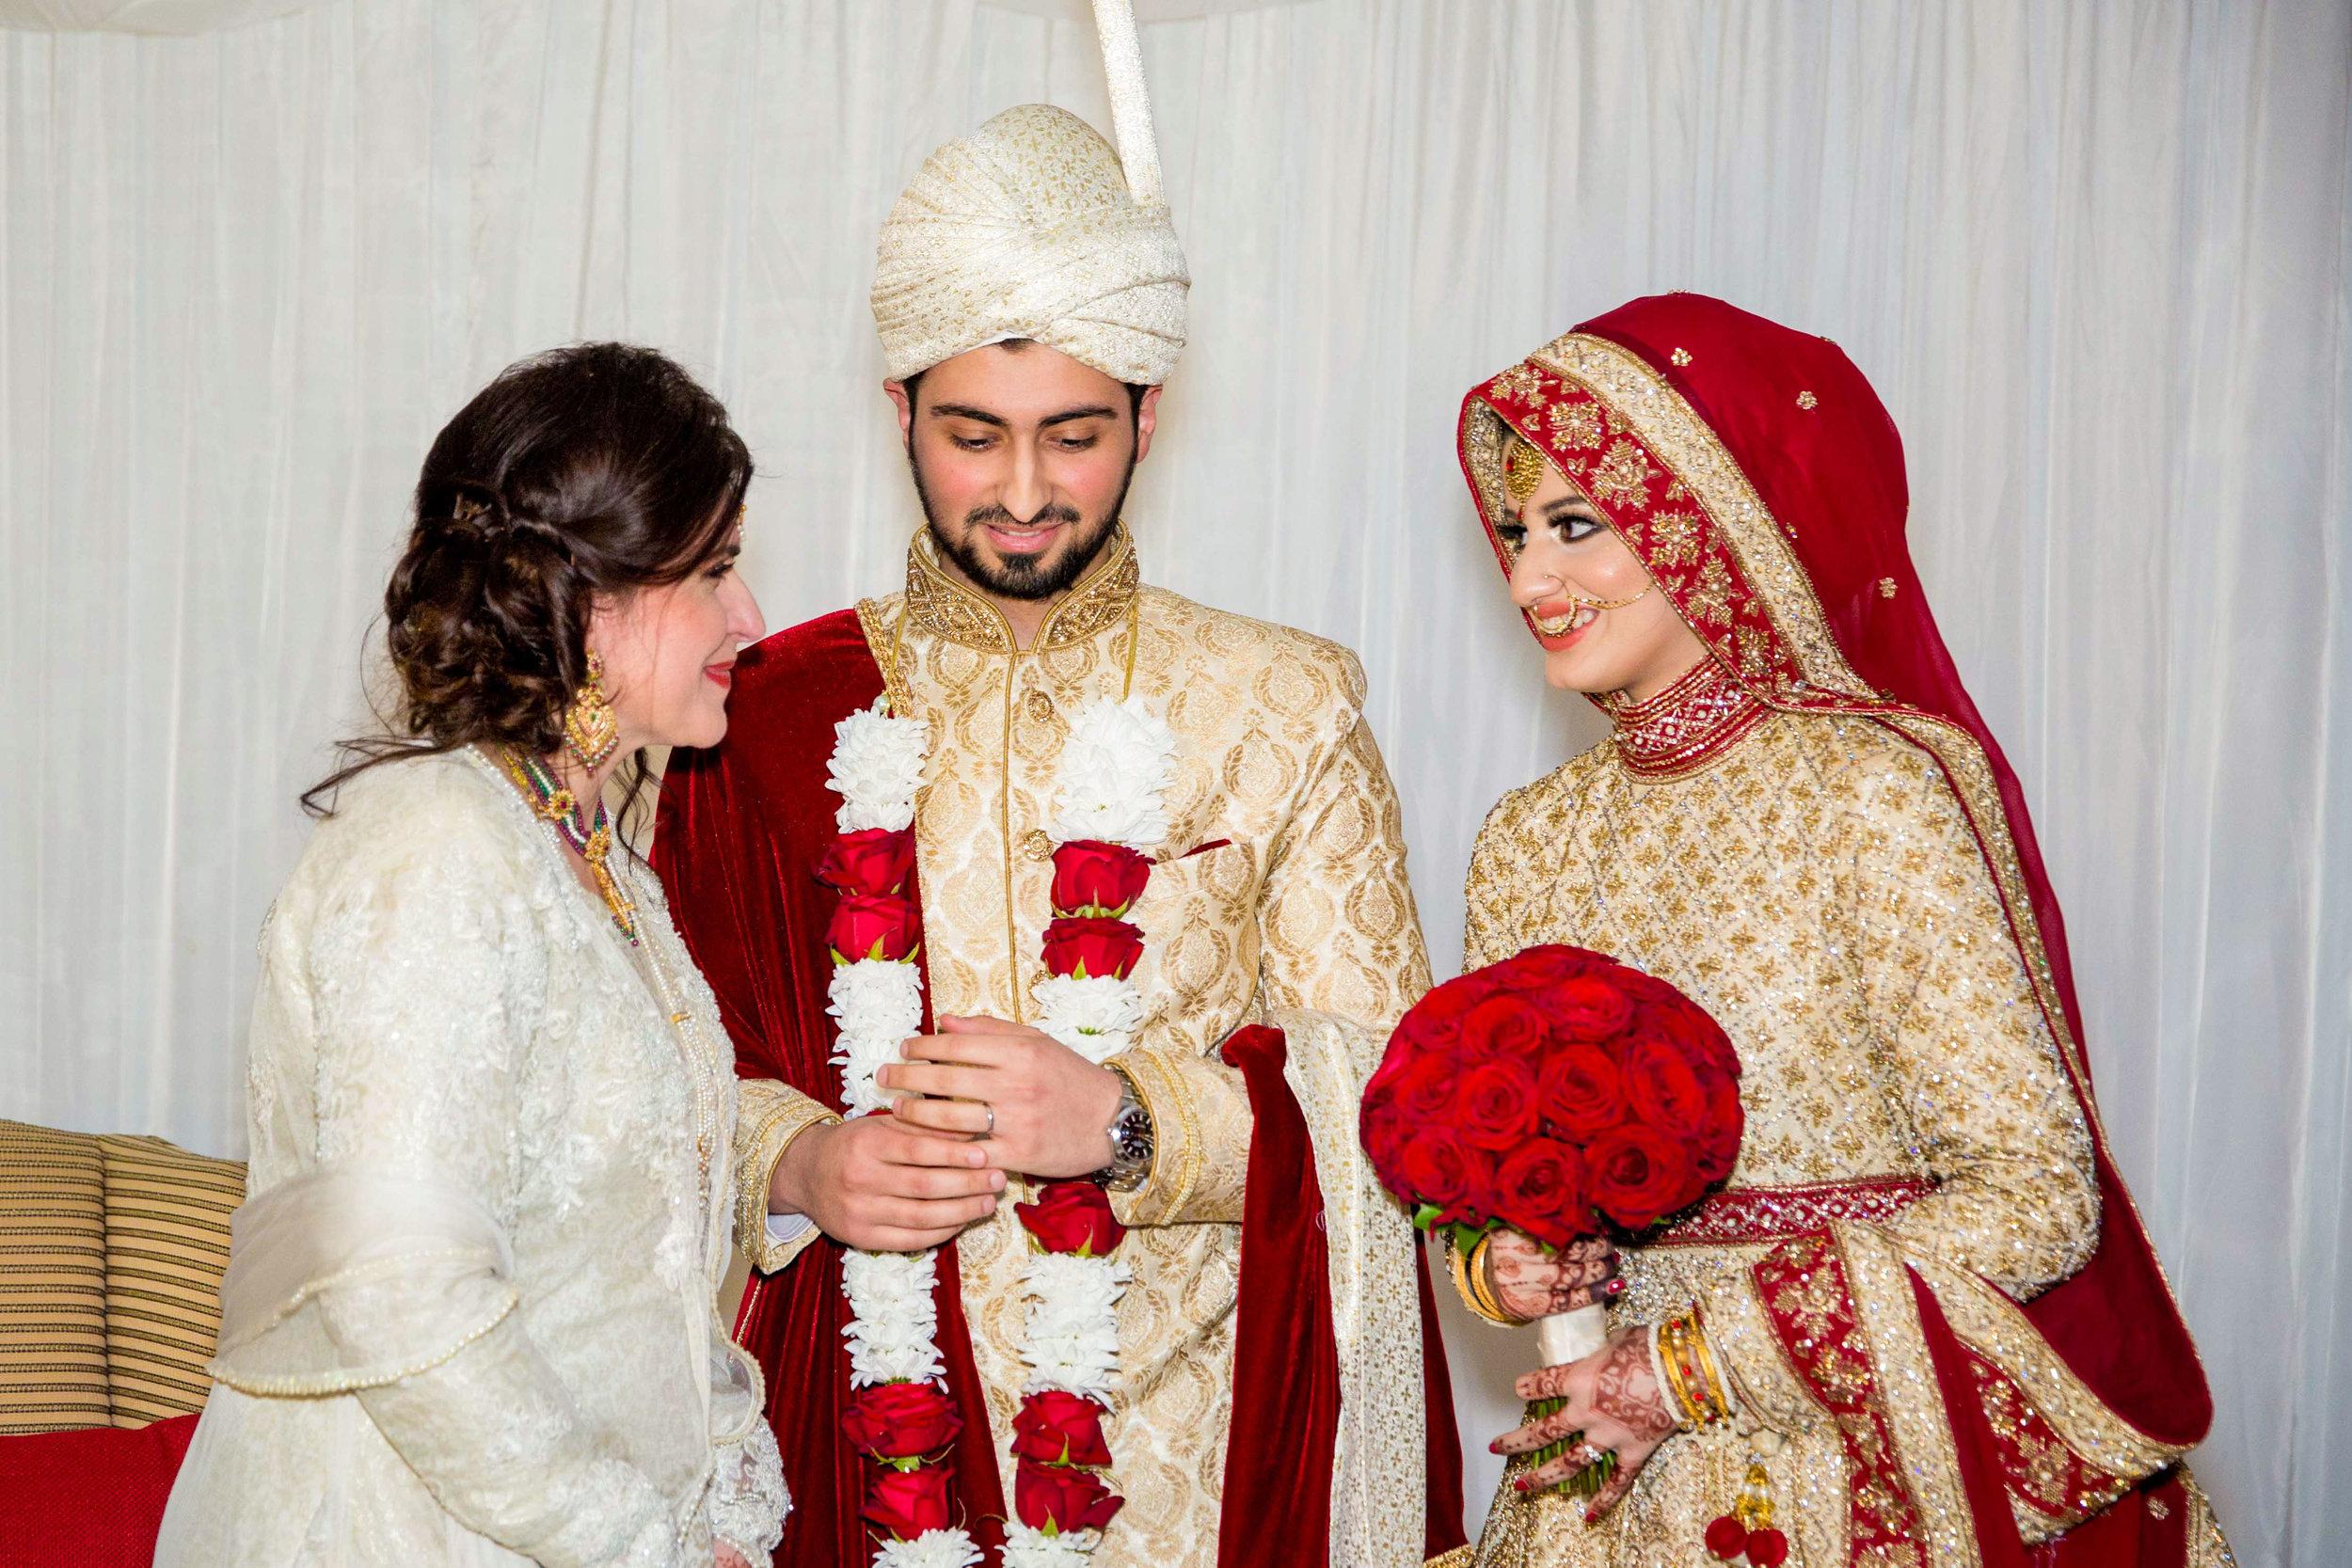 Macdonald-Berystede-Hotel-wedding-female-asian-wedding-photographer-london-natalia-smith-photography-64-2.jpg